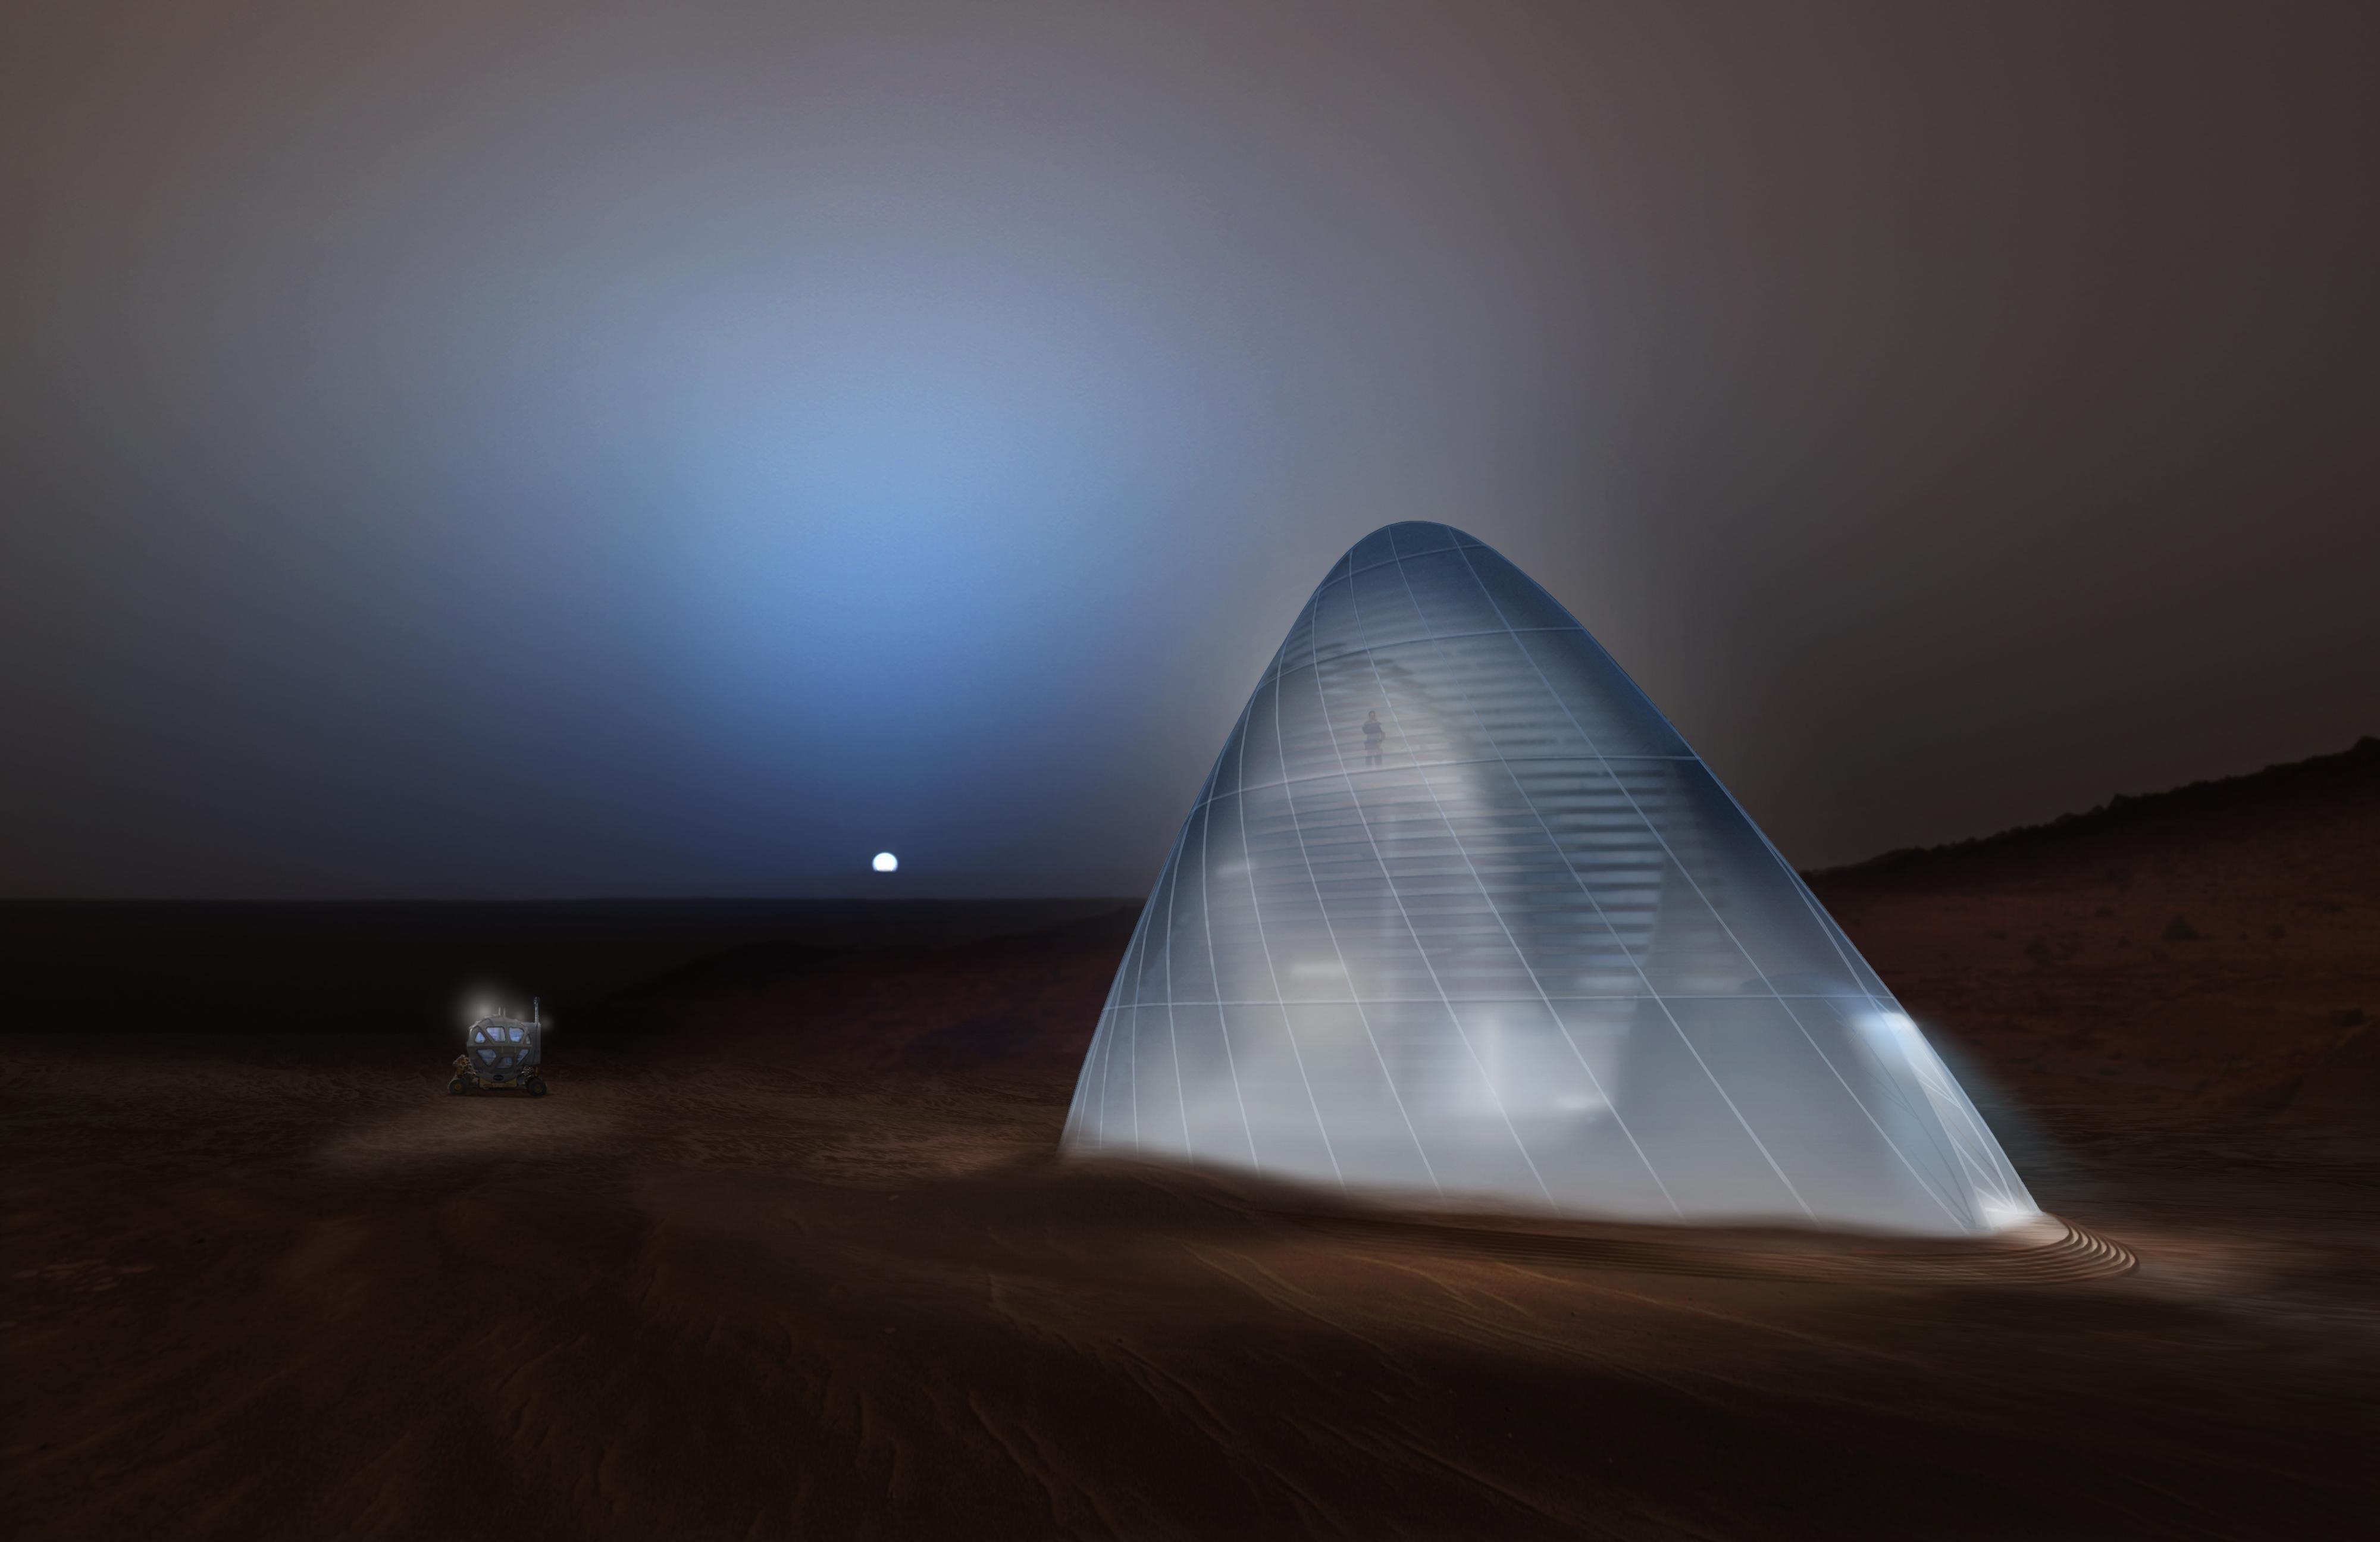 NASA Picks Winners for 3D-Printed Mars Habitat Design Contest